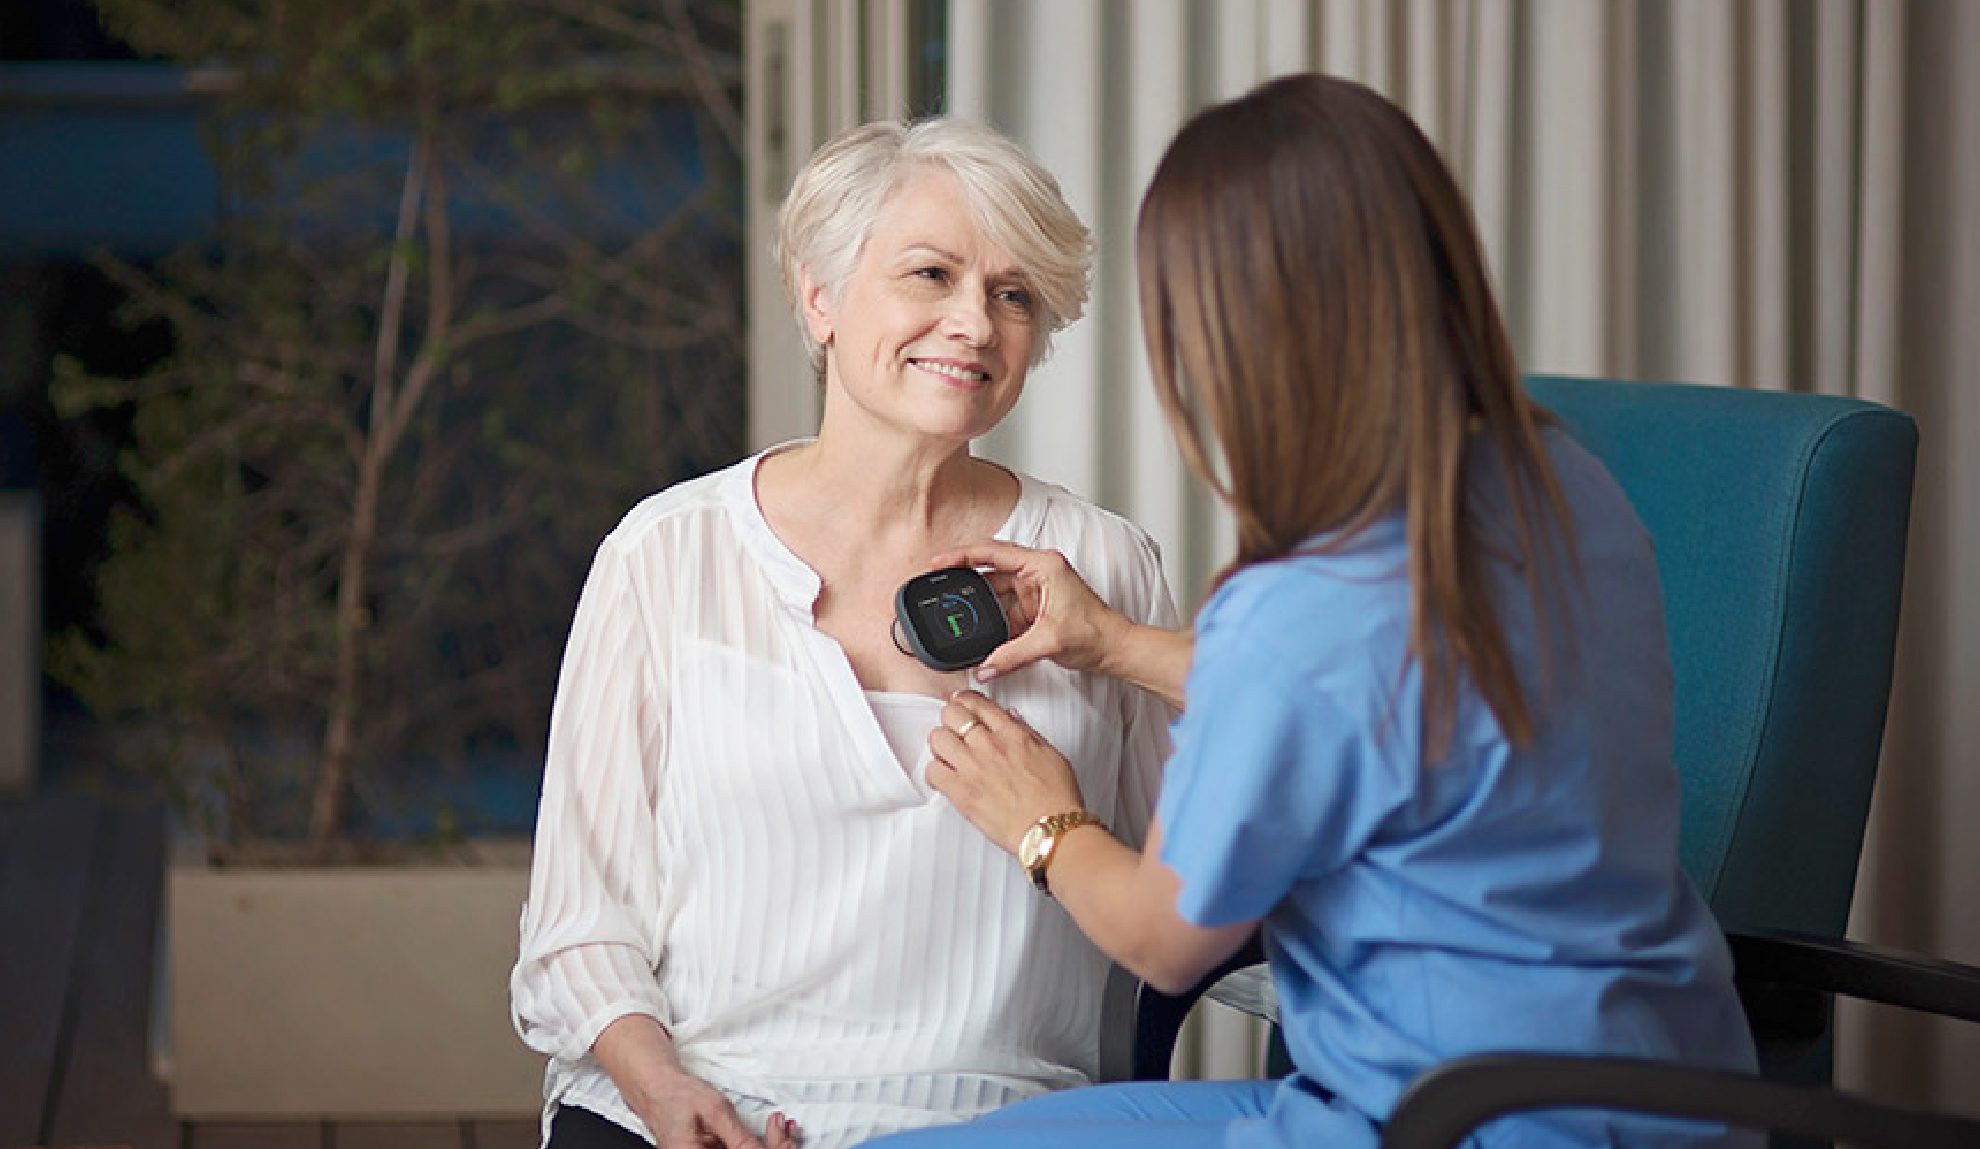 Beneficios de enviar una correcta información al médico vía Telemedicina